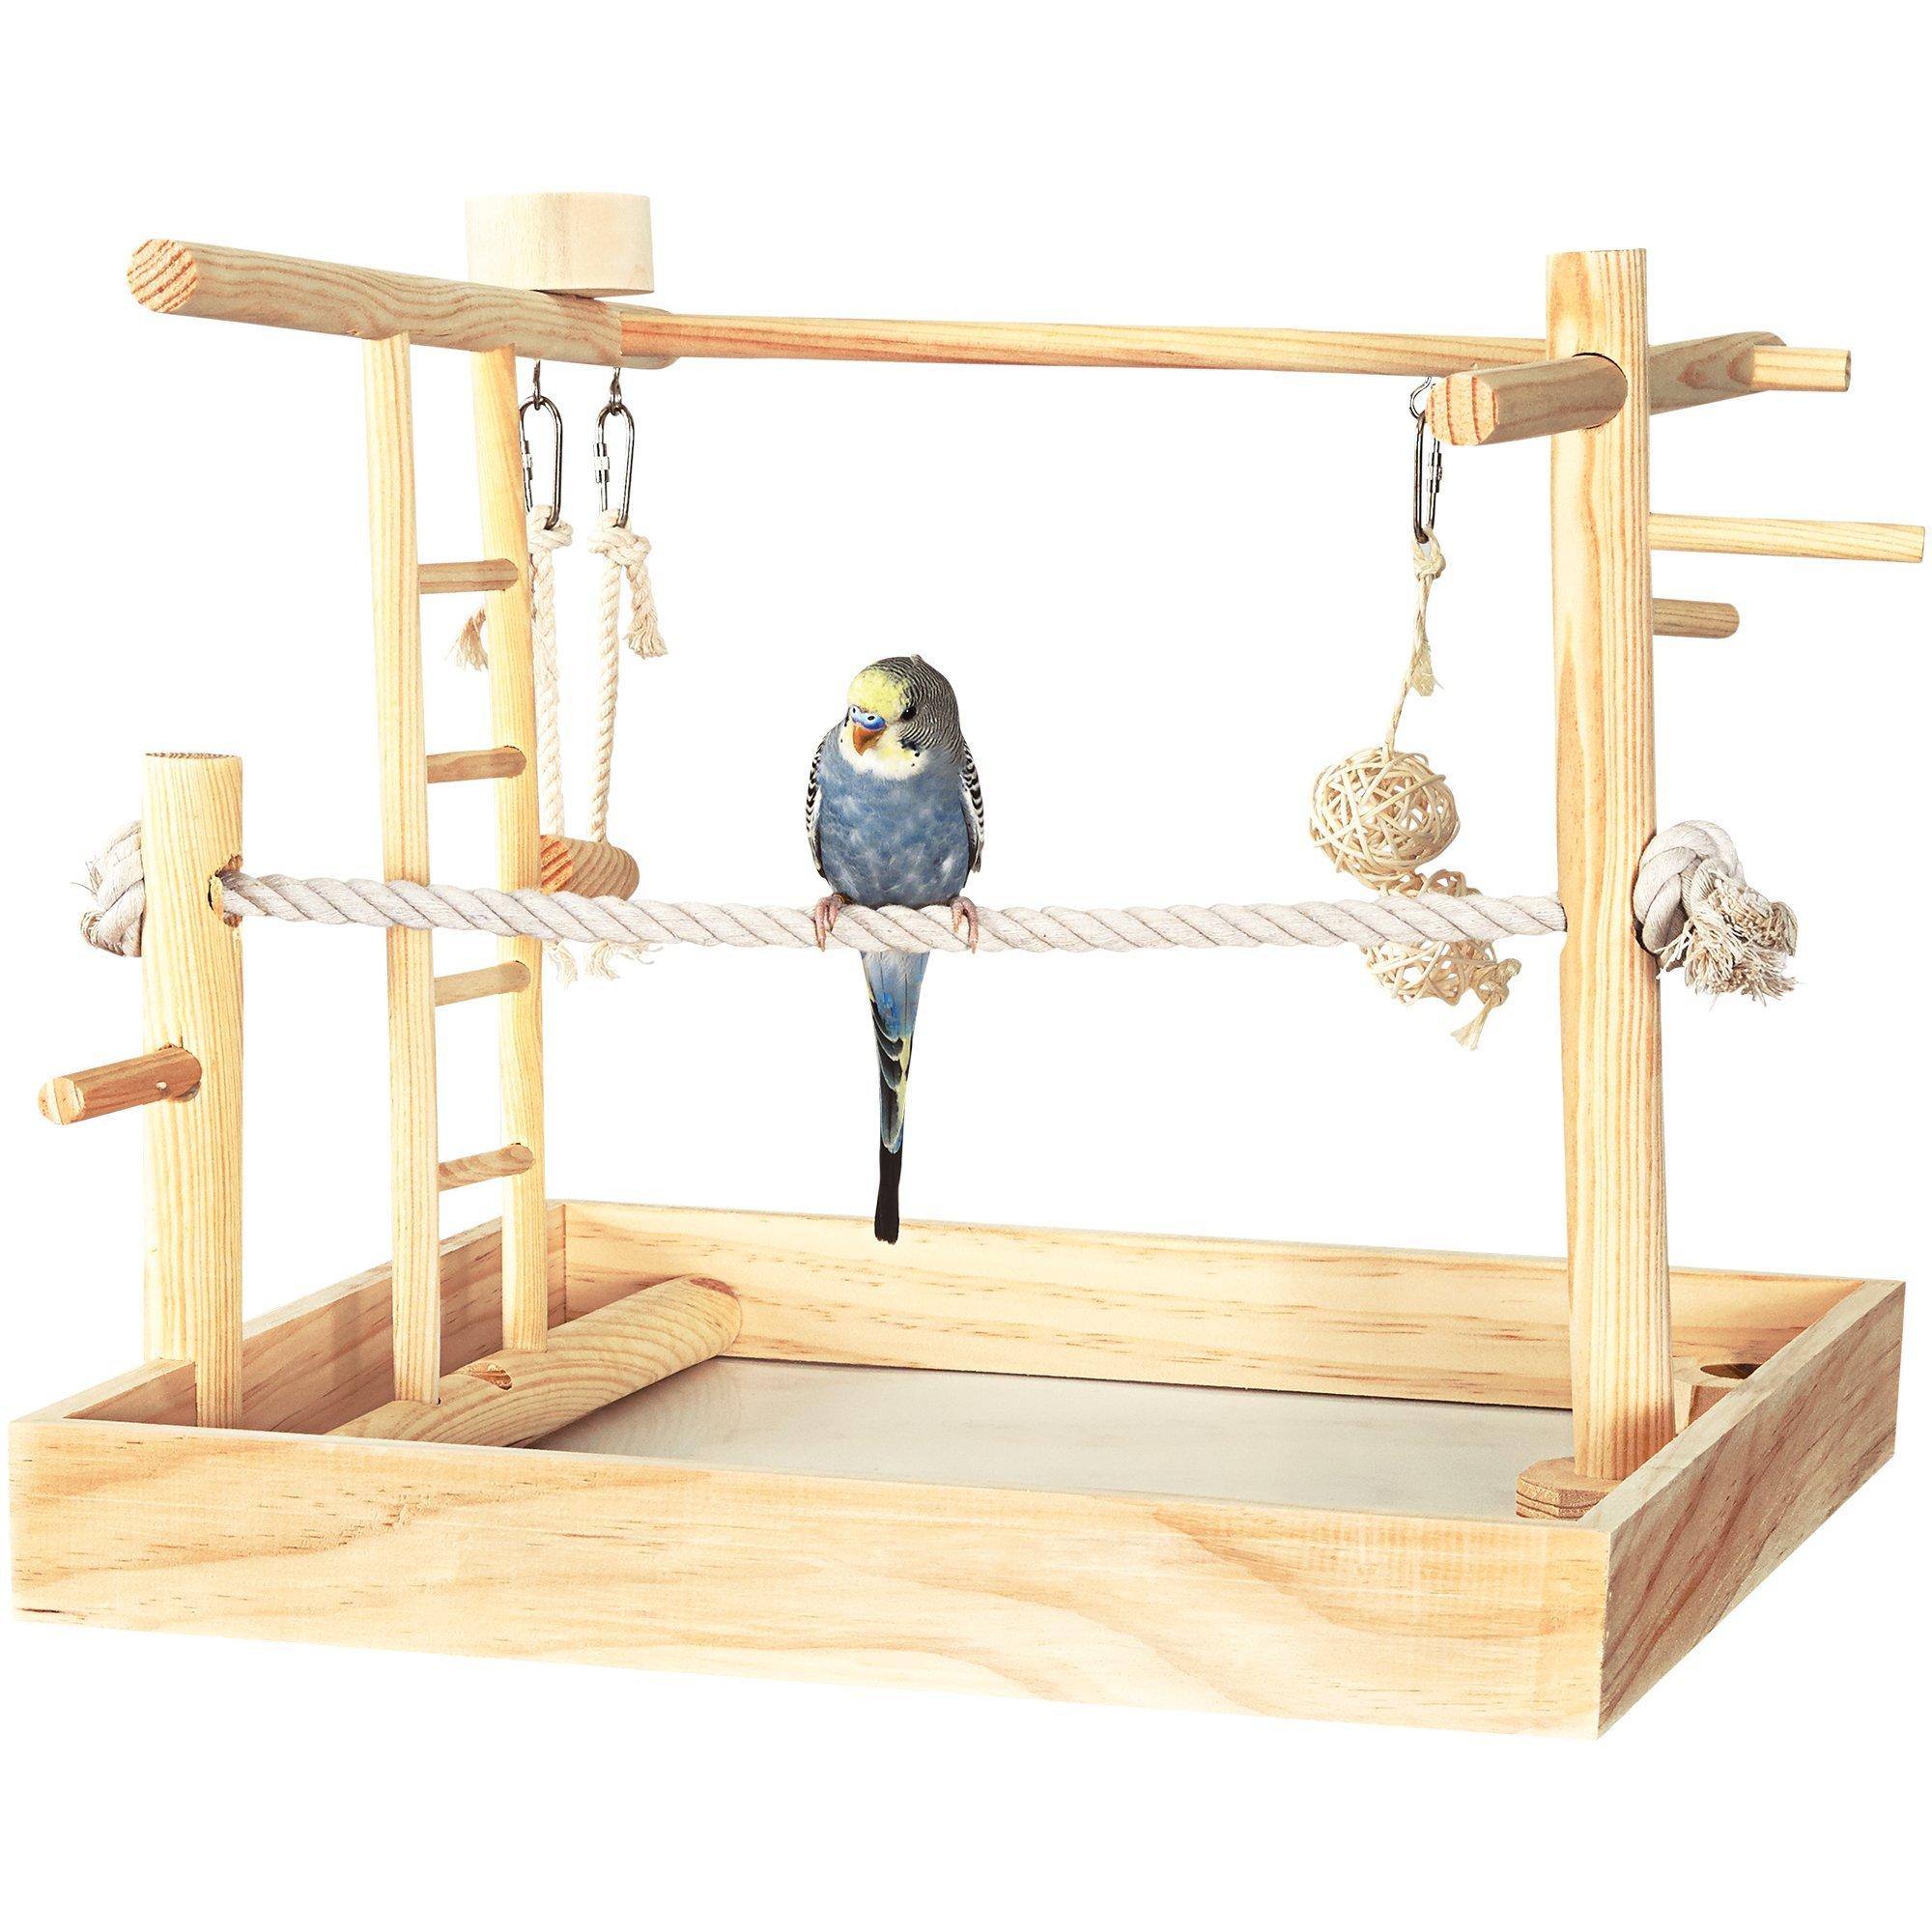 You & Me 3-in-1 Playground for Birds, 15'' L X 15'' W X 16'' H, 15 in by You&Me